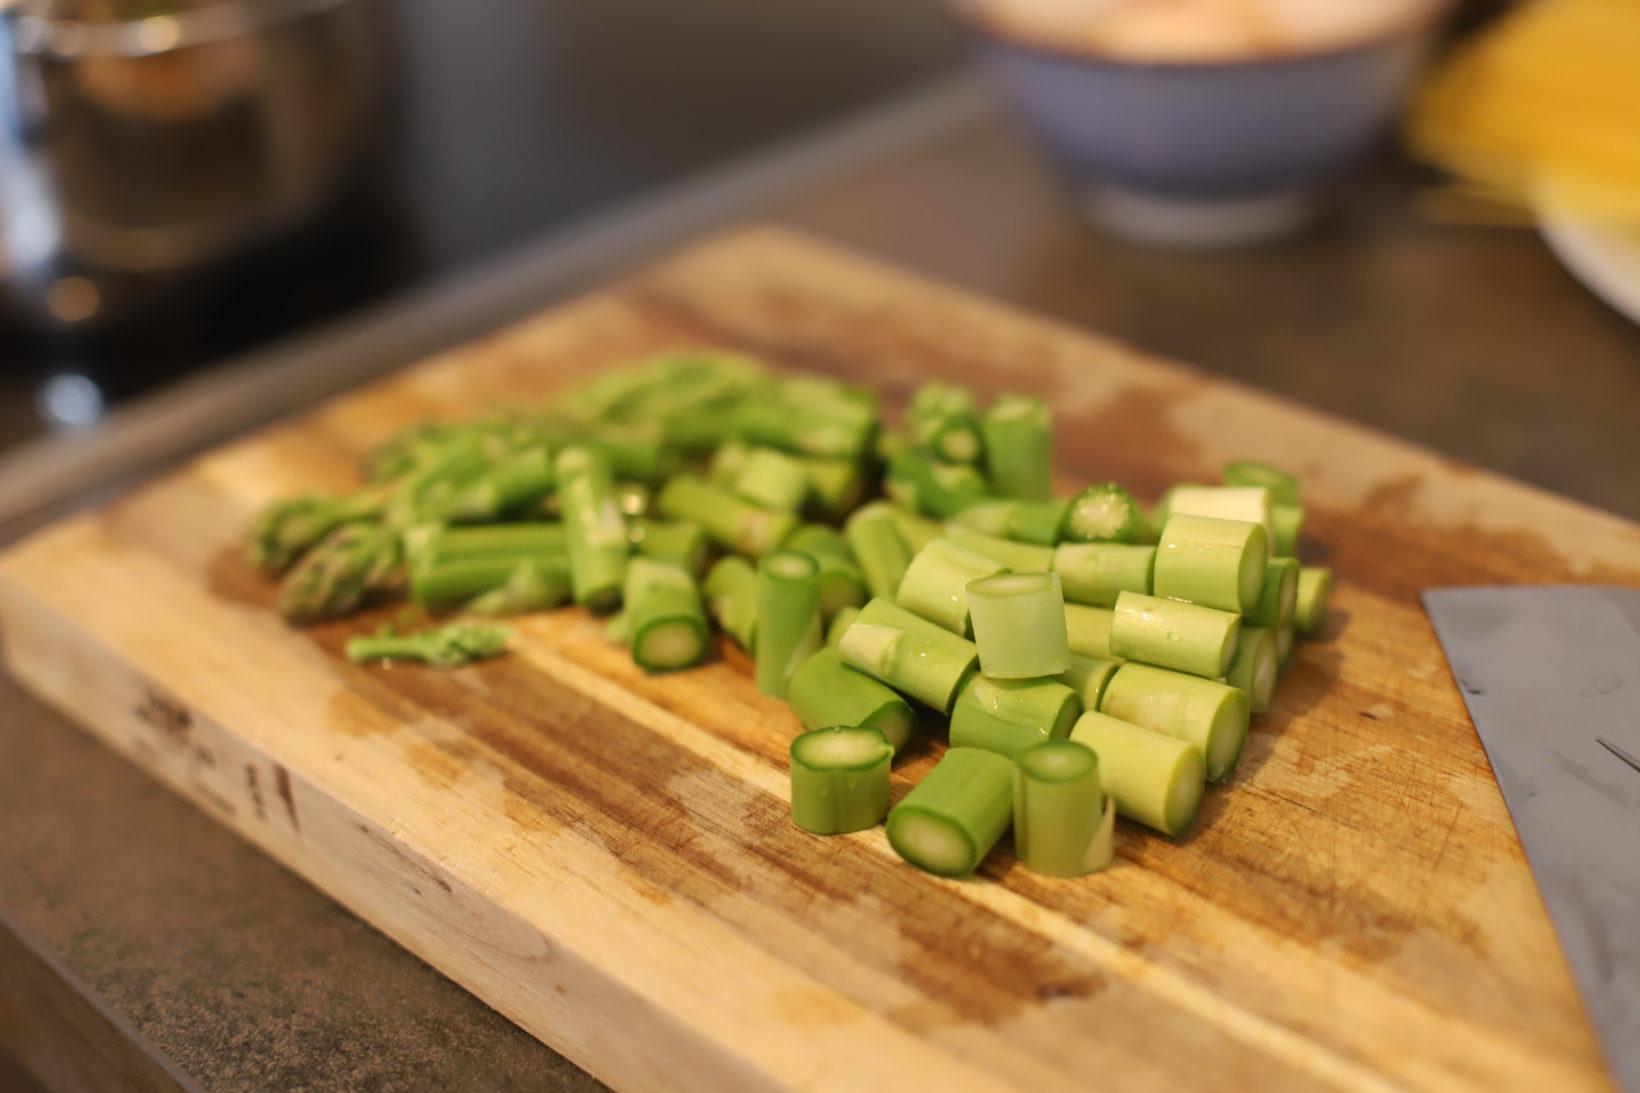 raw asparagus cut into pieces